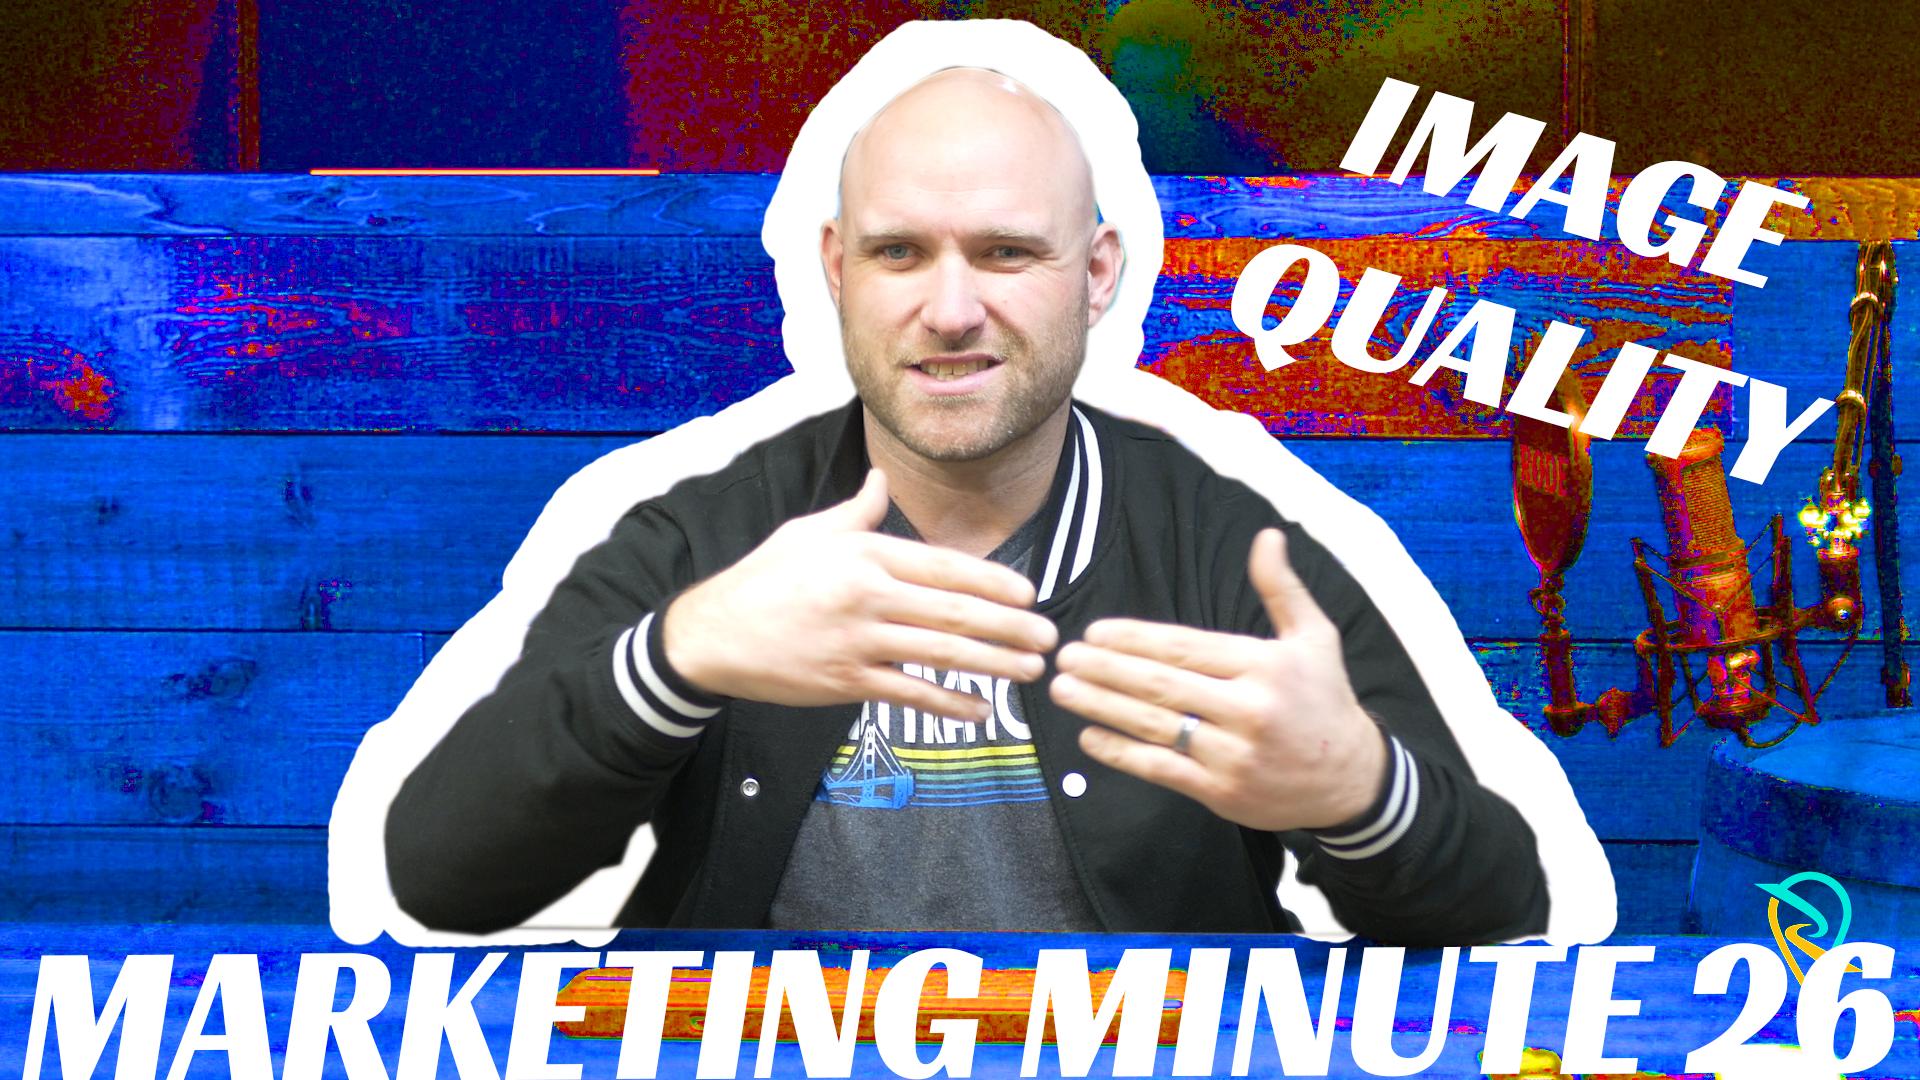 marketing-minute-image-quality-marketing